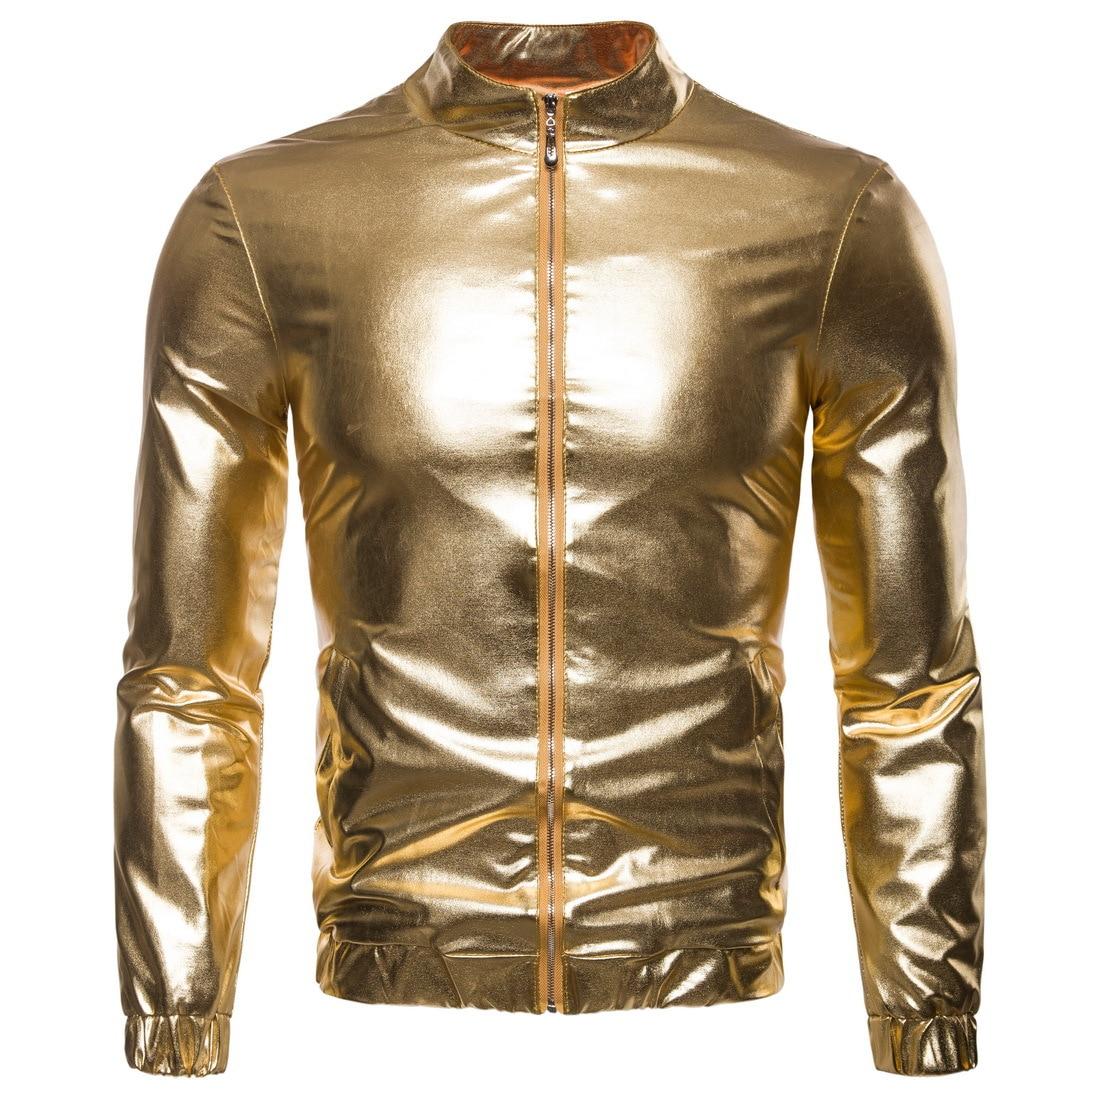 2018 Autumn winter 3D print men's casual jackets Gold&silver bling Stage nightclub male coat Zipper Slim fitness Jacket MQ793